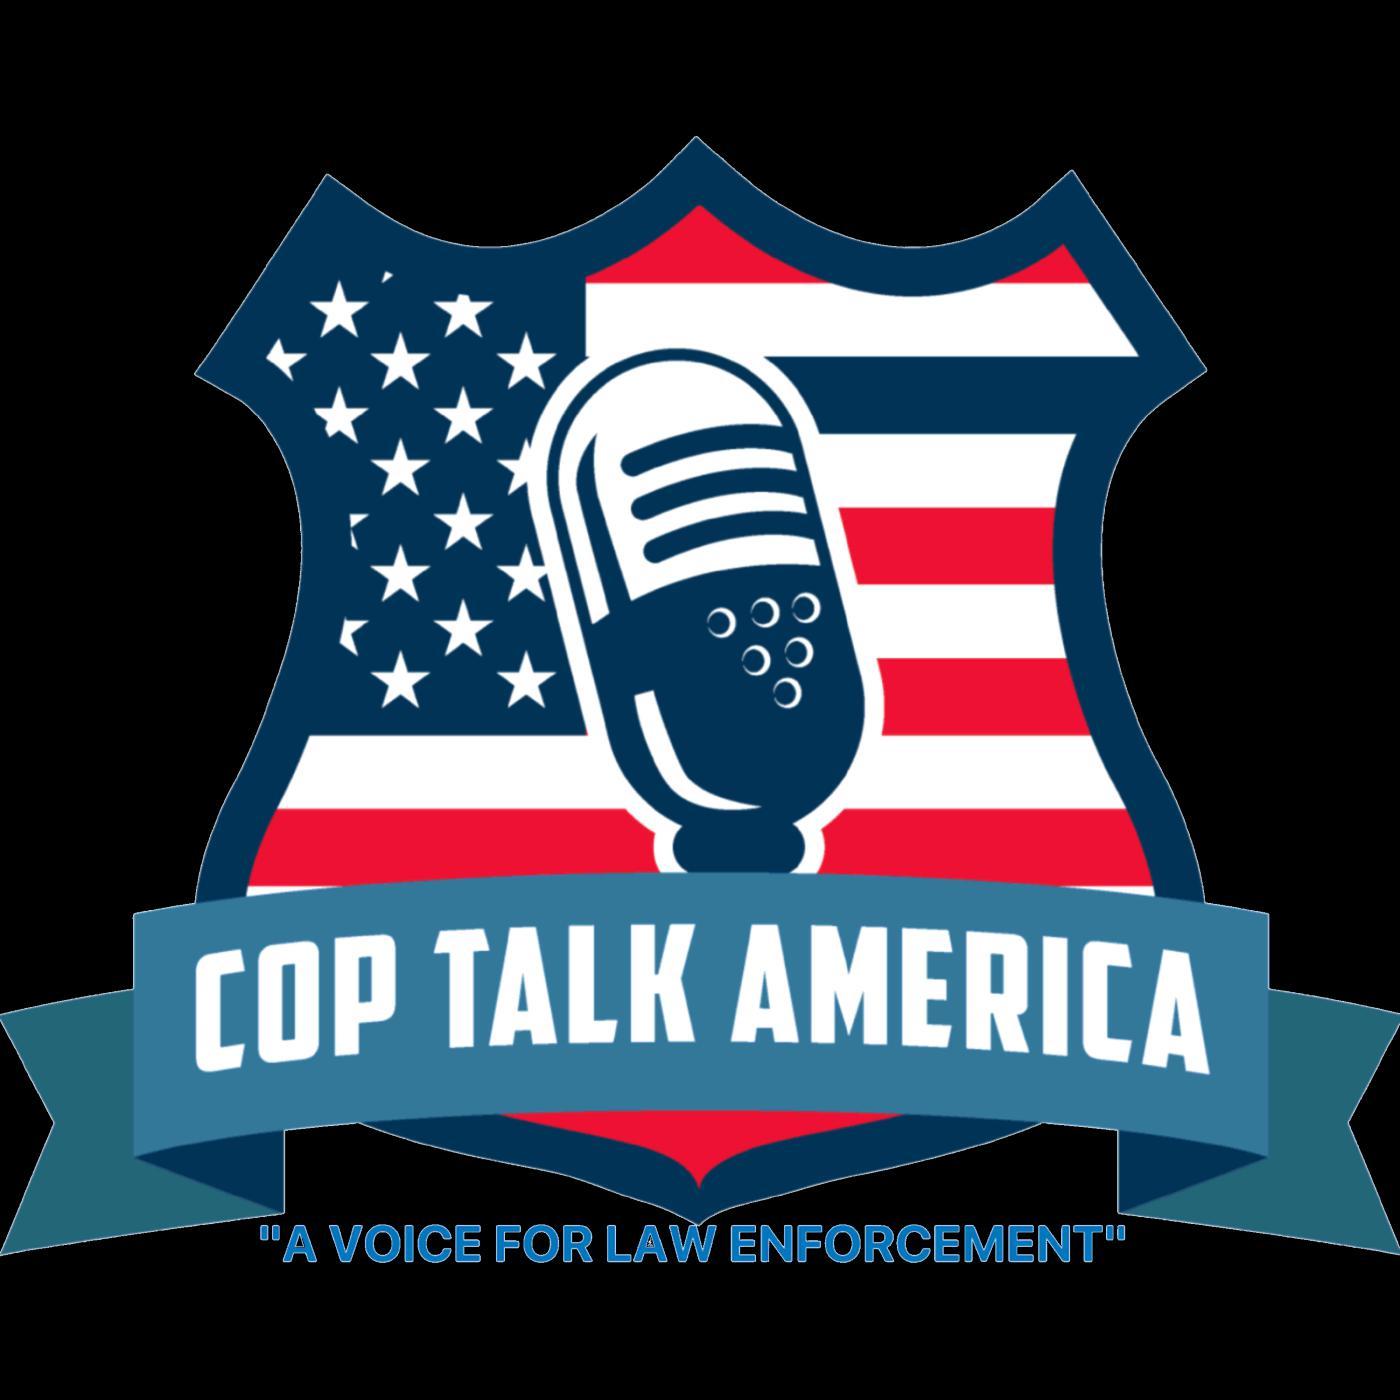 Cop Talk America (podcast) - CopTalkAmerica com | Listen Notes